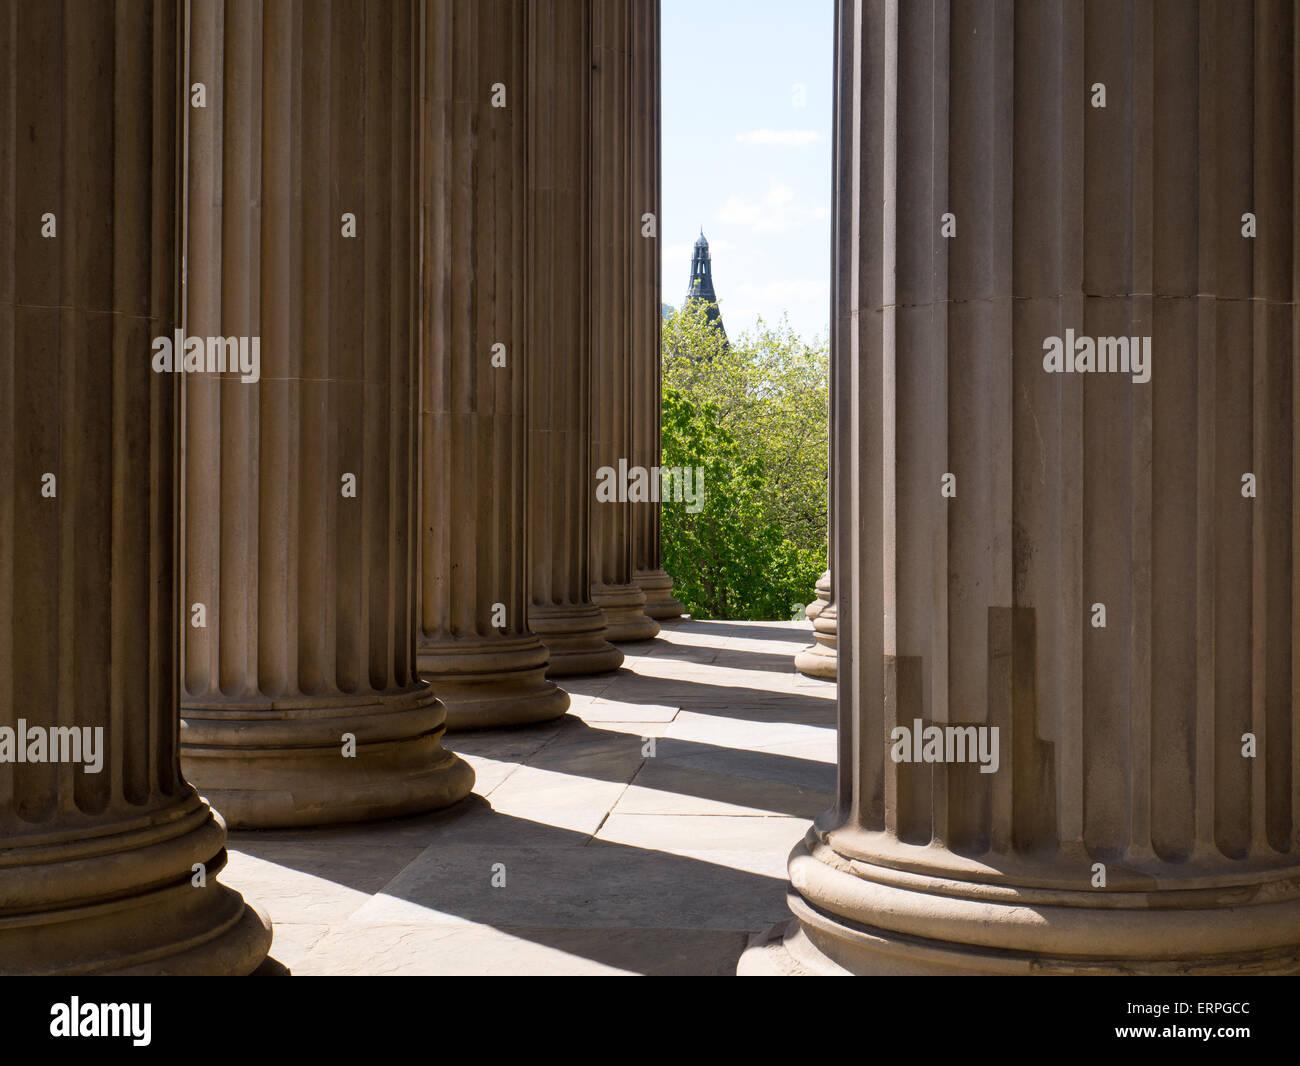 Corinthian columns at St George's Hall, Liverpool - Stock Image